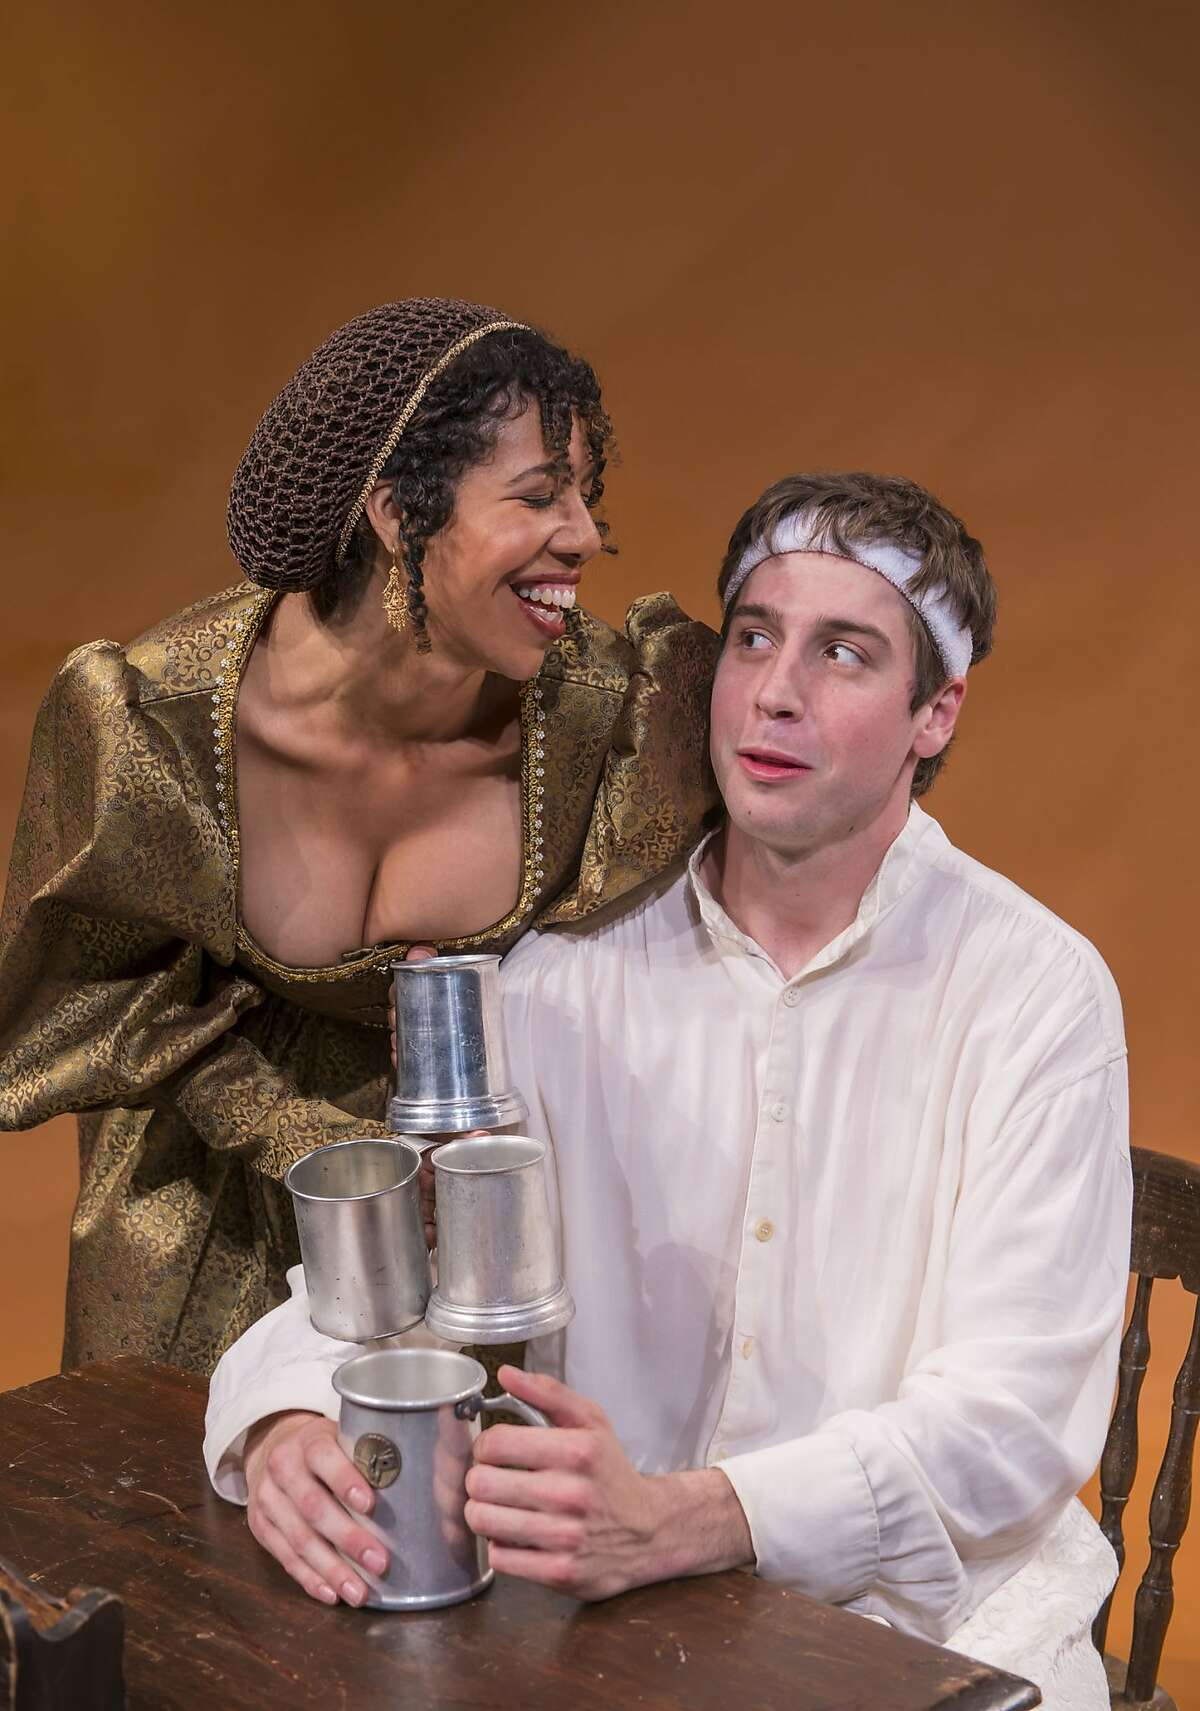 University senior Hamlet (Jeremy Kahn, right) catches the eye of a bar maid (Elizabeth Carter) in David Davalos'